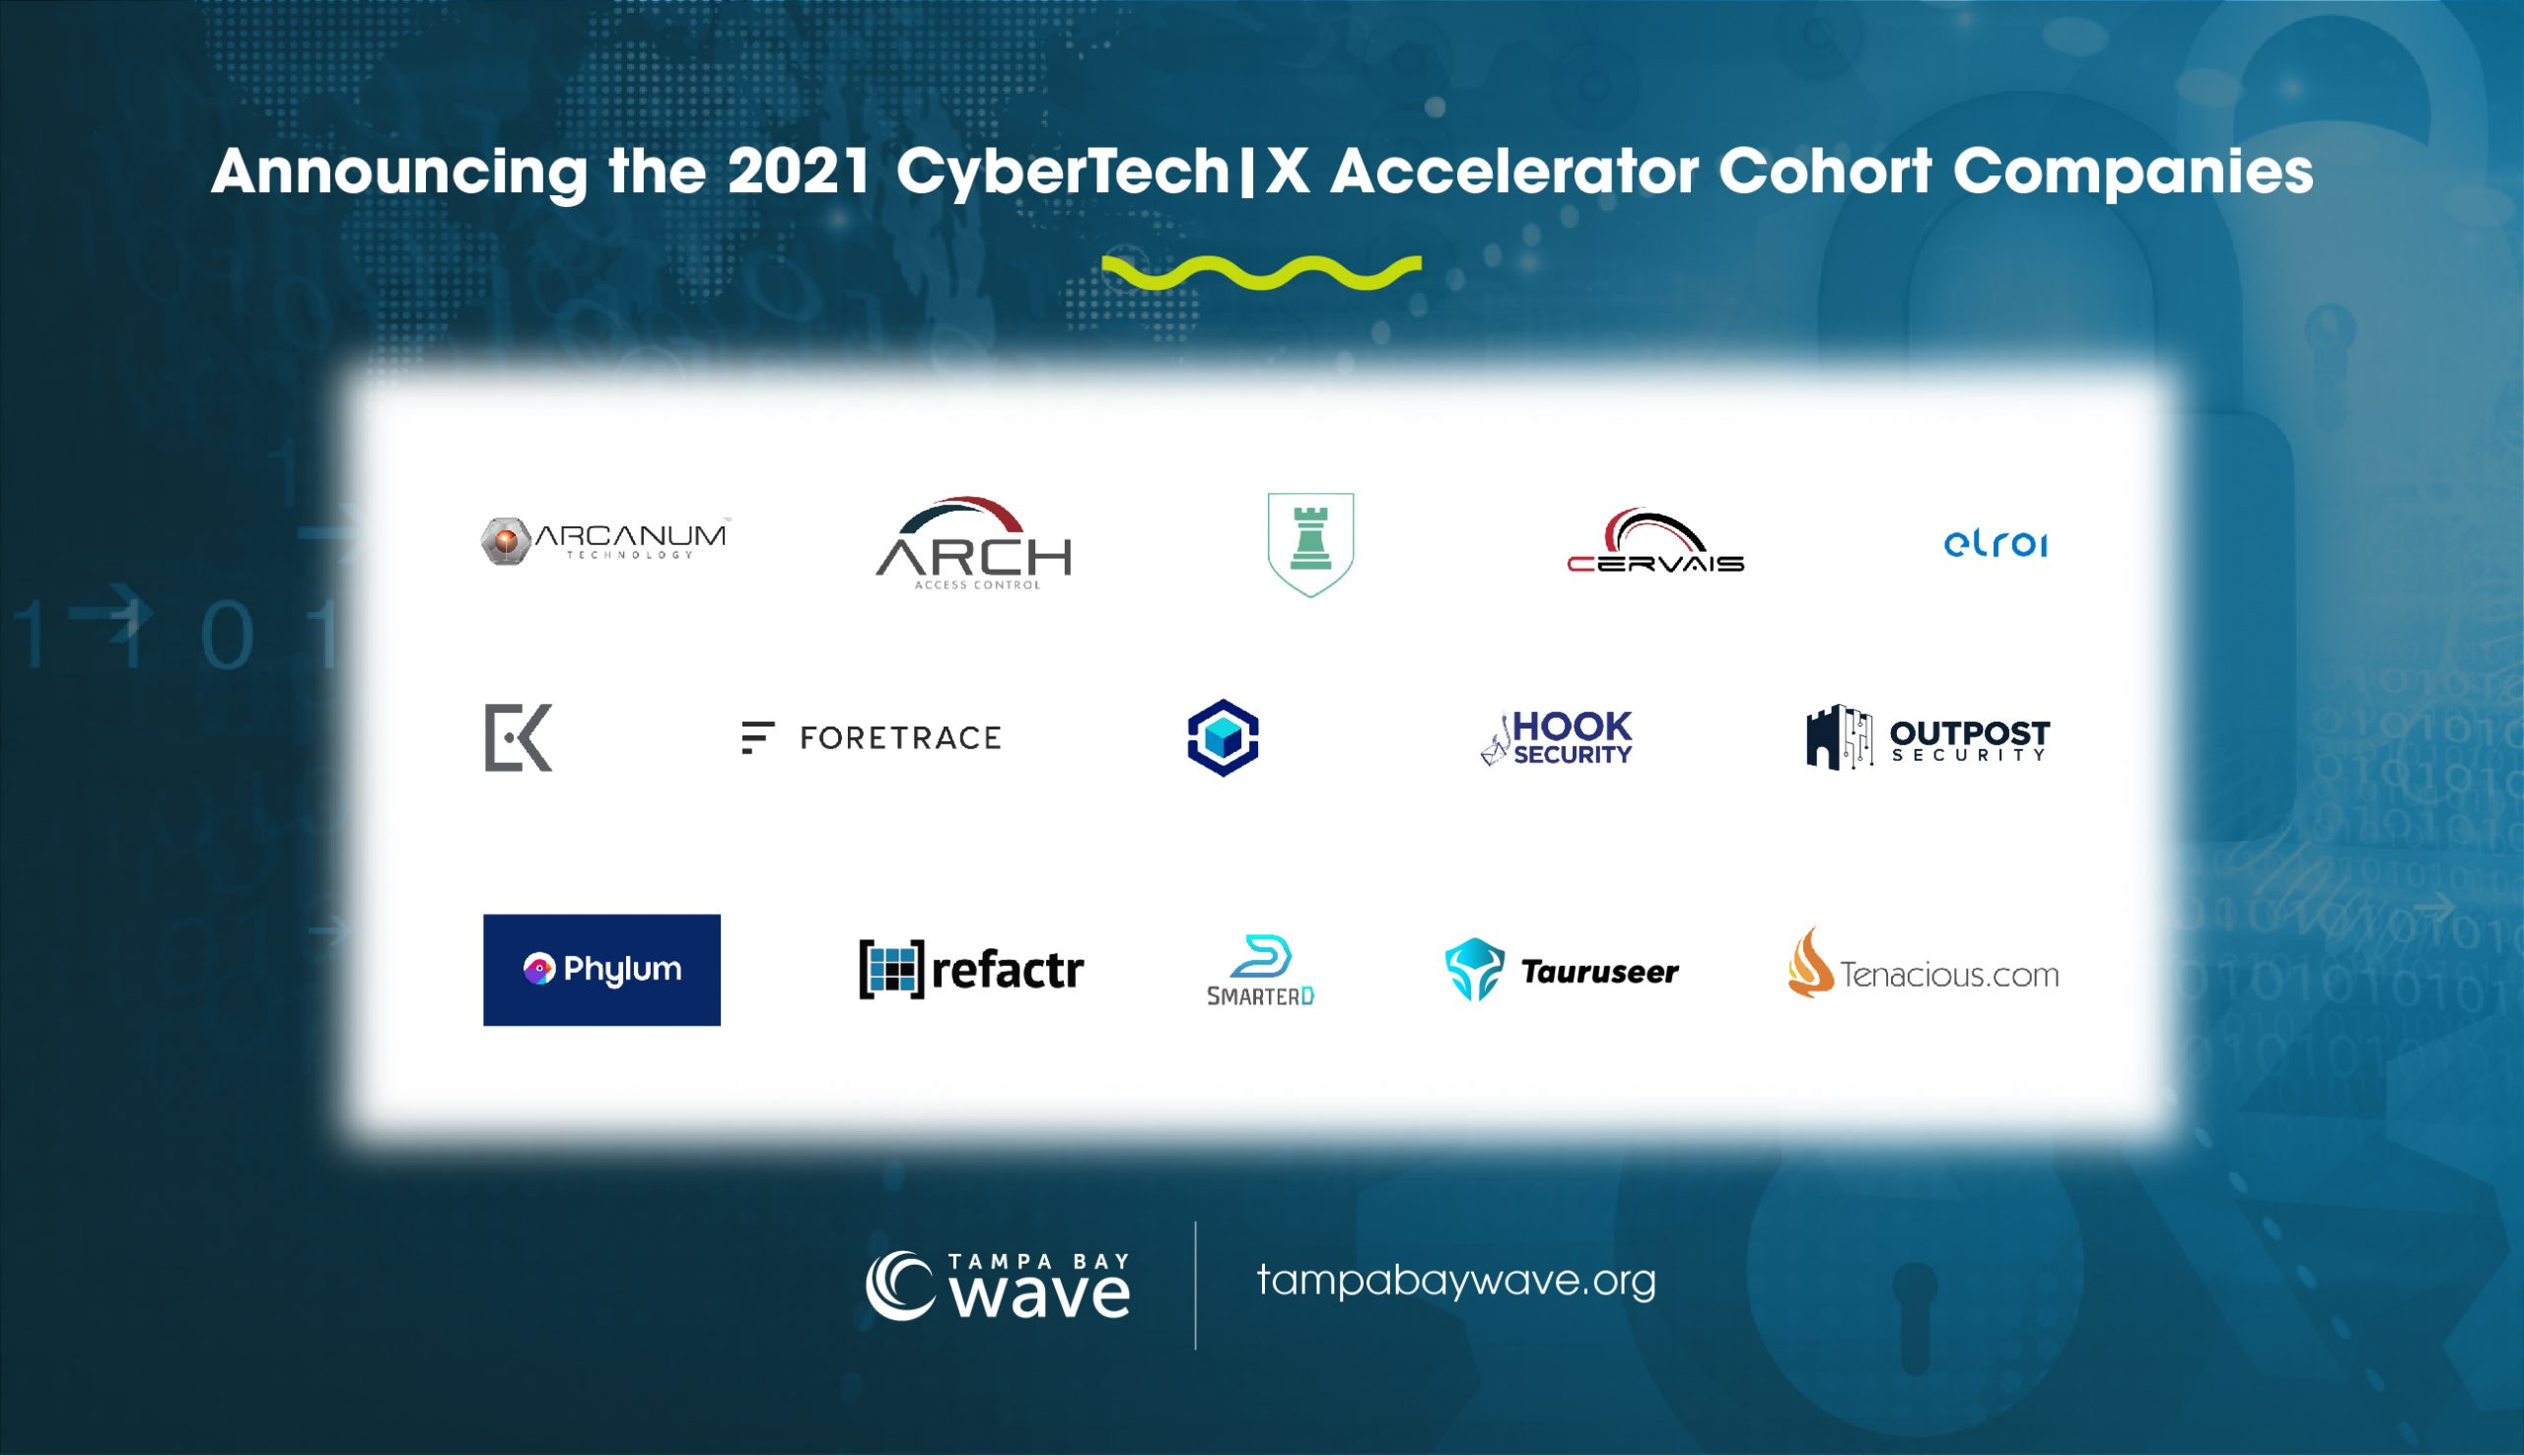 Tampa Bay Wave - CyberTech|X Accelerator Cohort 2021